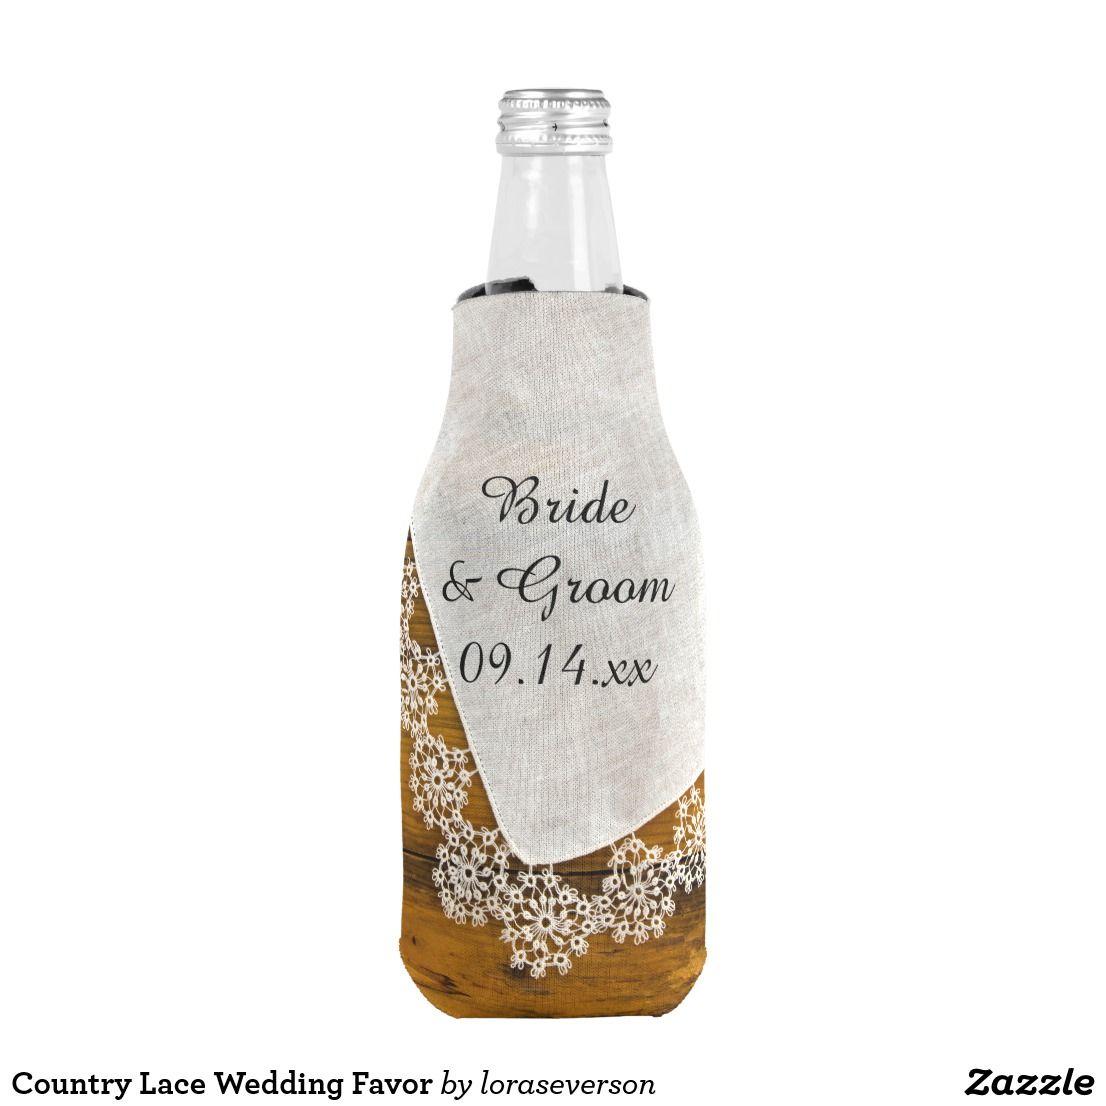 Country Lace Barn Wedding Favor Bottle Cooler | Wedding koozies ...